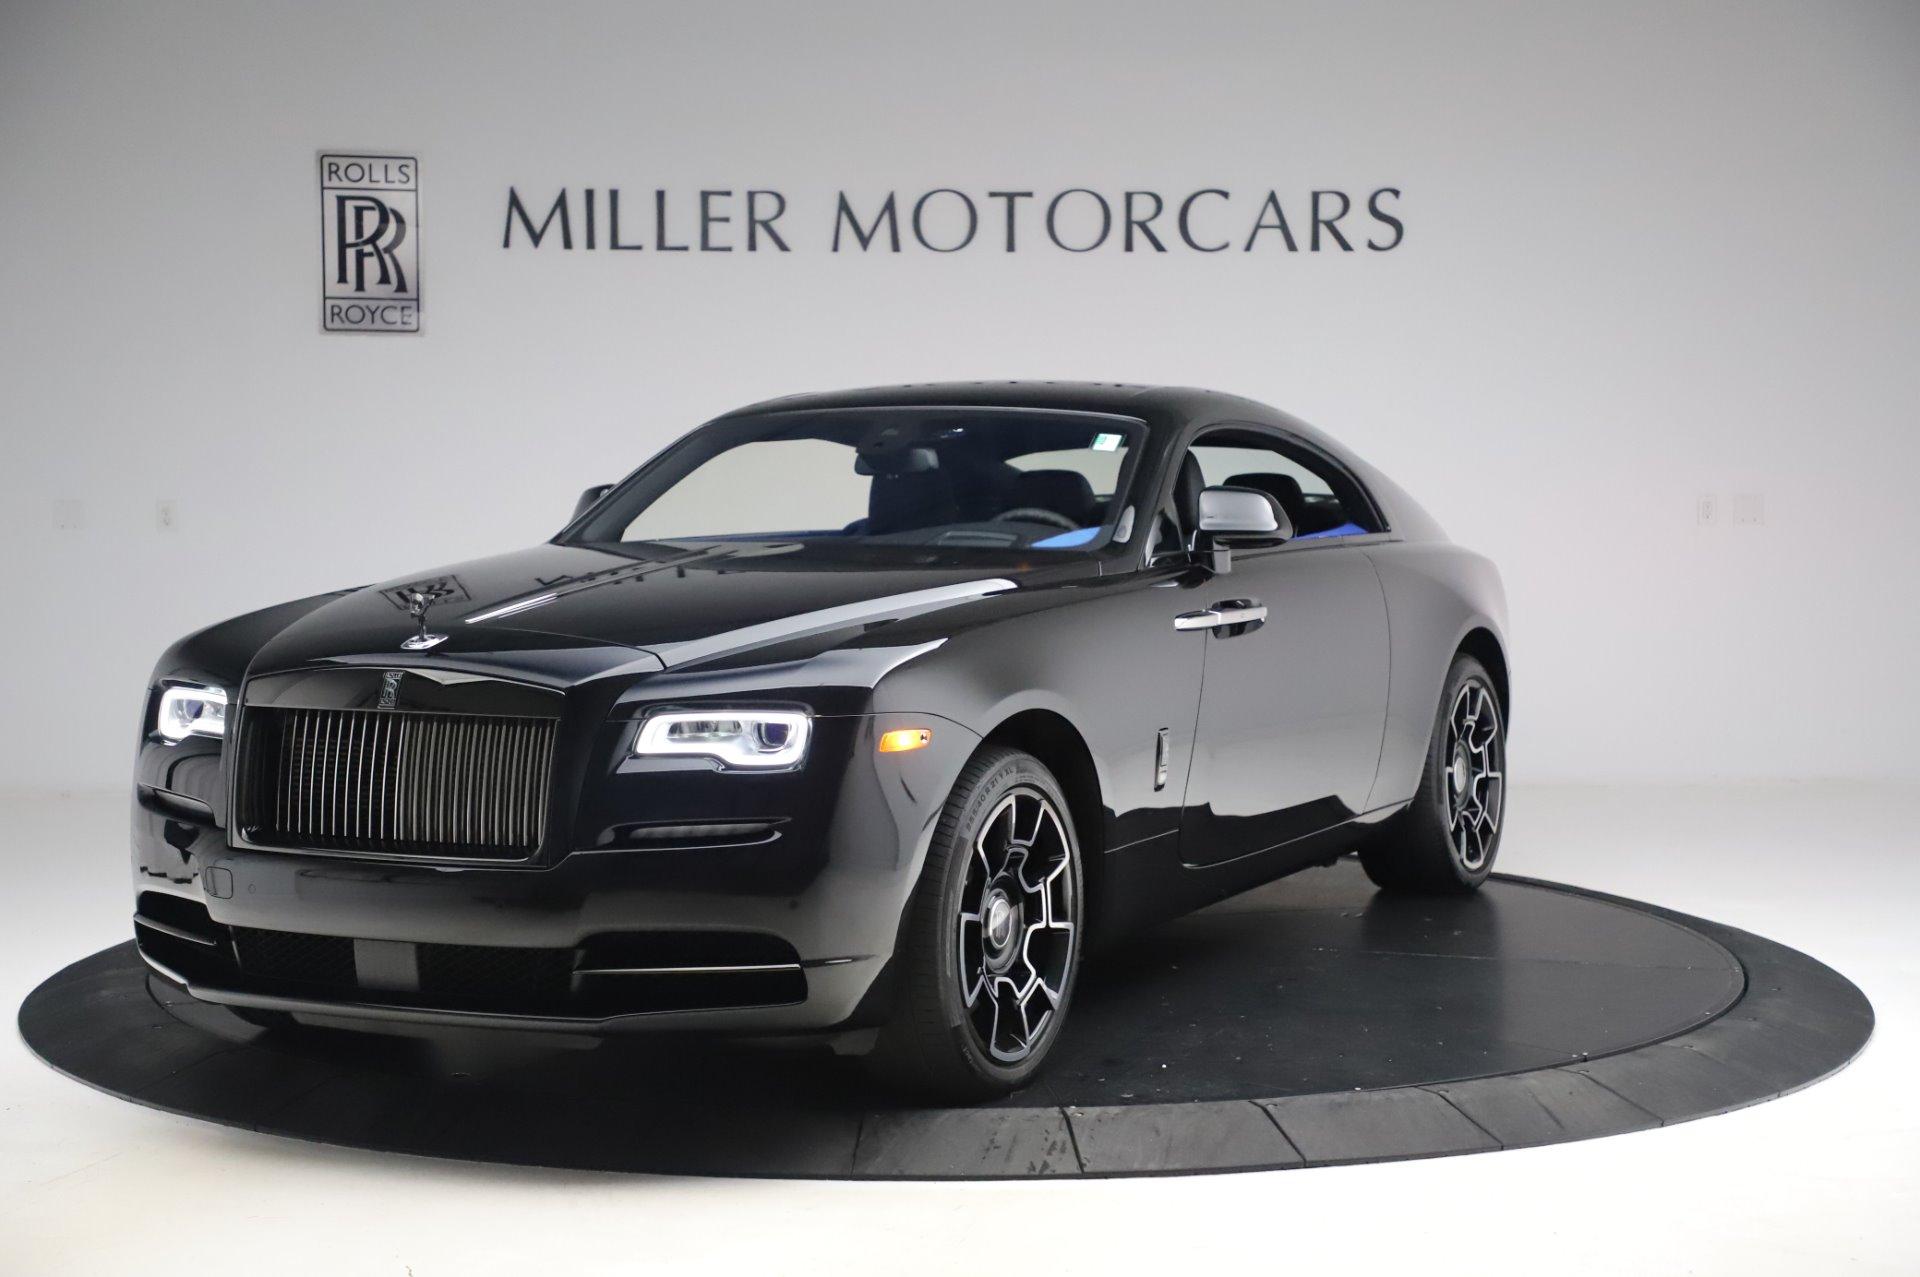 Used 2017 Rolls-Royce Wraith Black Badge for sale Sold at Maserati of Westport in Westport CT 06880 1